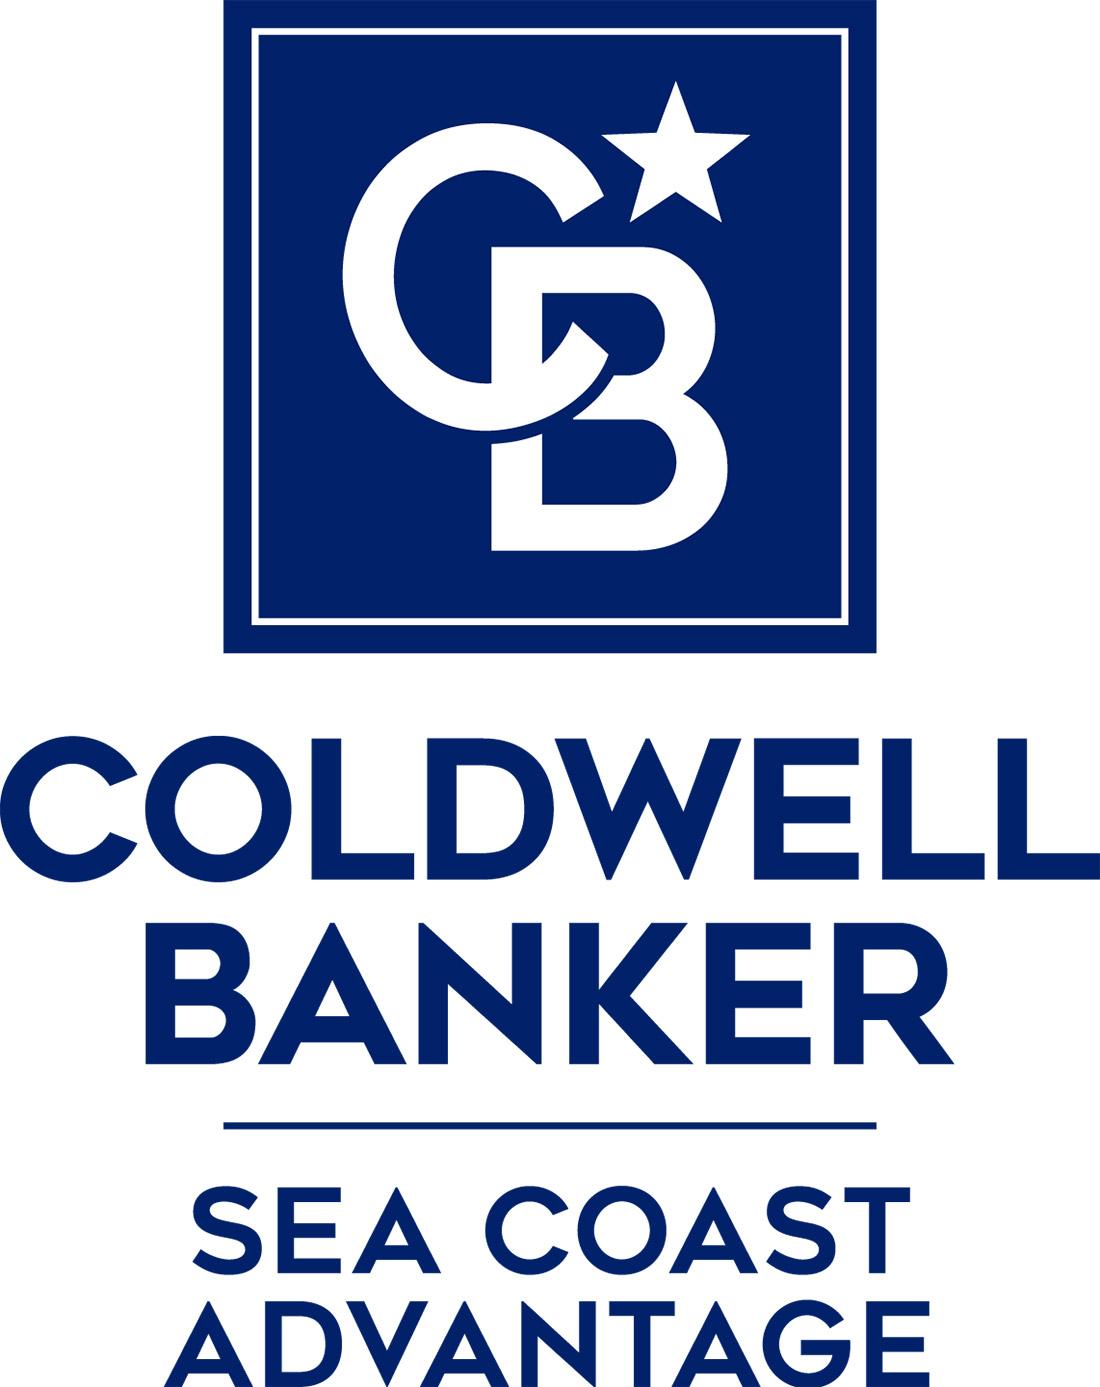 Jimmie Pendergrass - Coldwell Banker Sea Coast Advantage Realty Logo